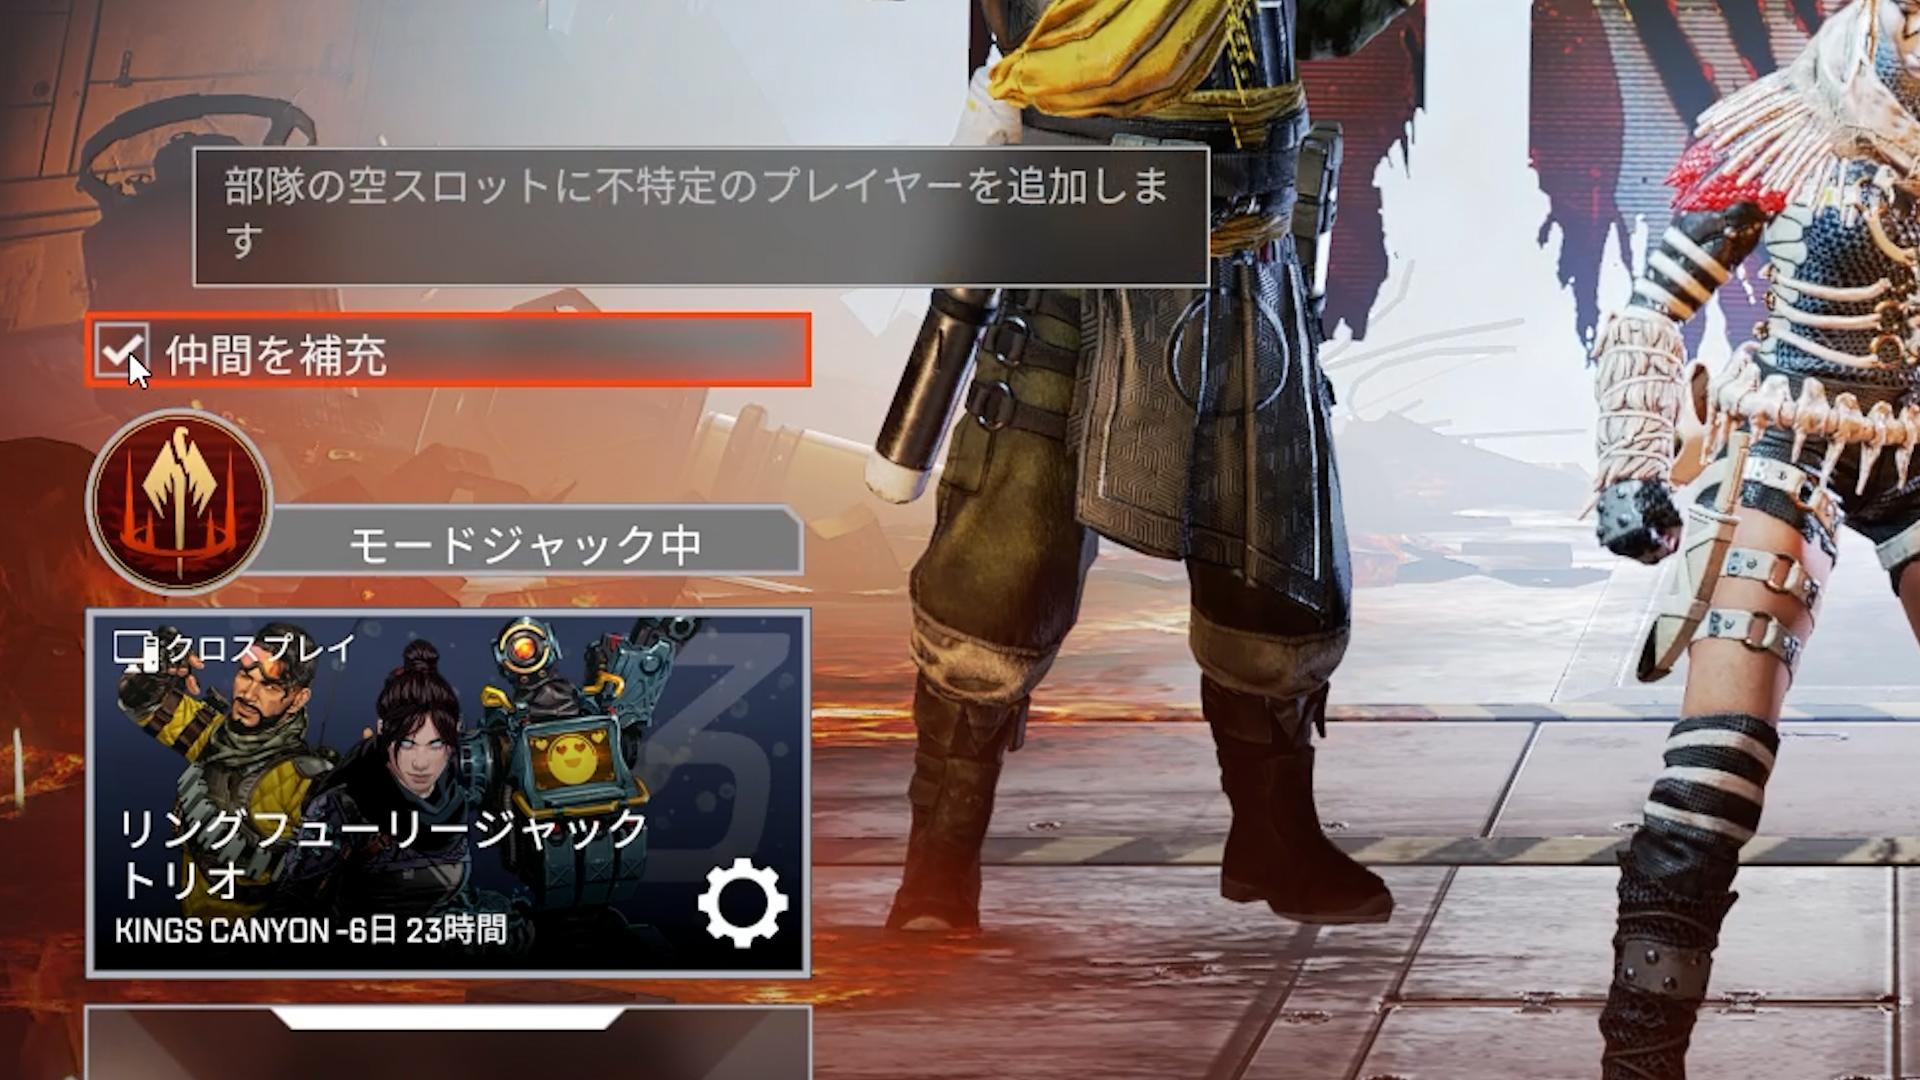 【APEX】アプデ後の新機能で「野良チームメイト」を入れずにマッチ検索が可能になったぞ!